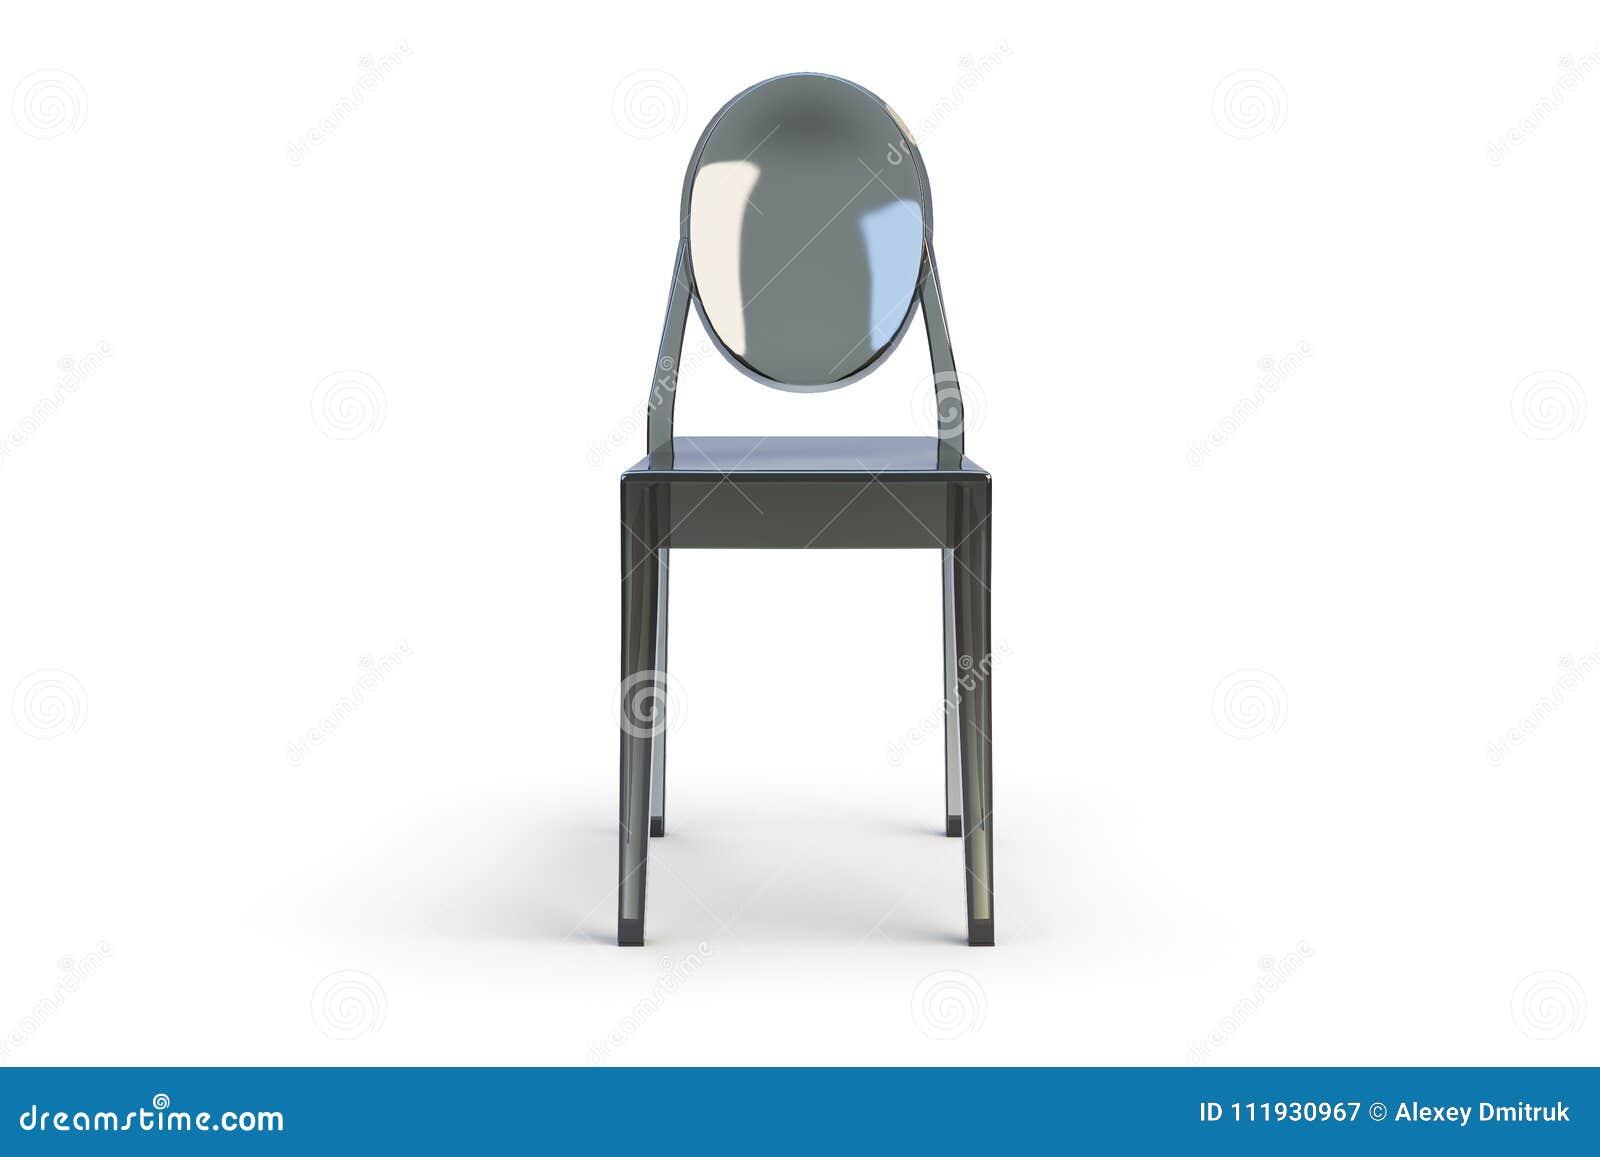 Sedia Panton Trasparente : Sedia trasparente. noleggio sedie. artic sedia trasparente